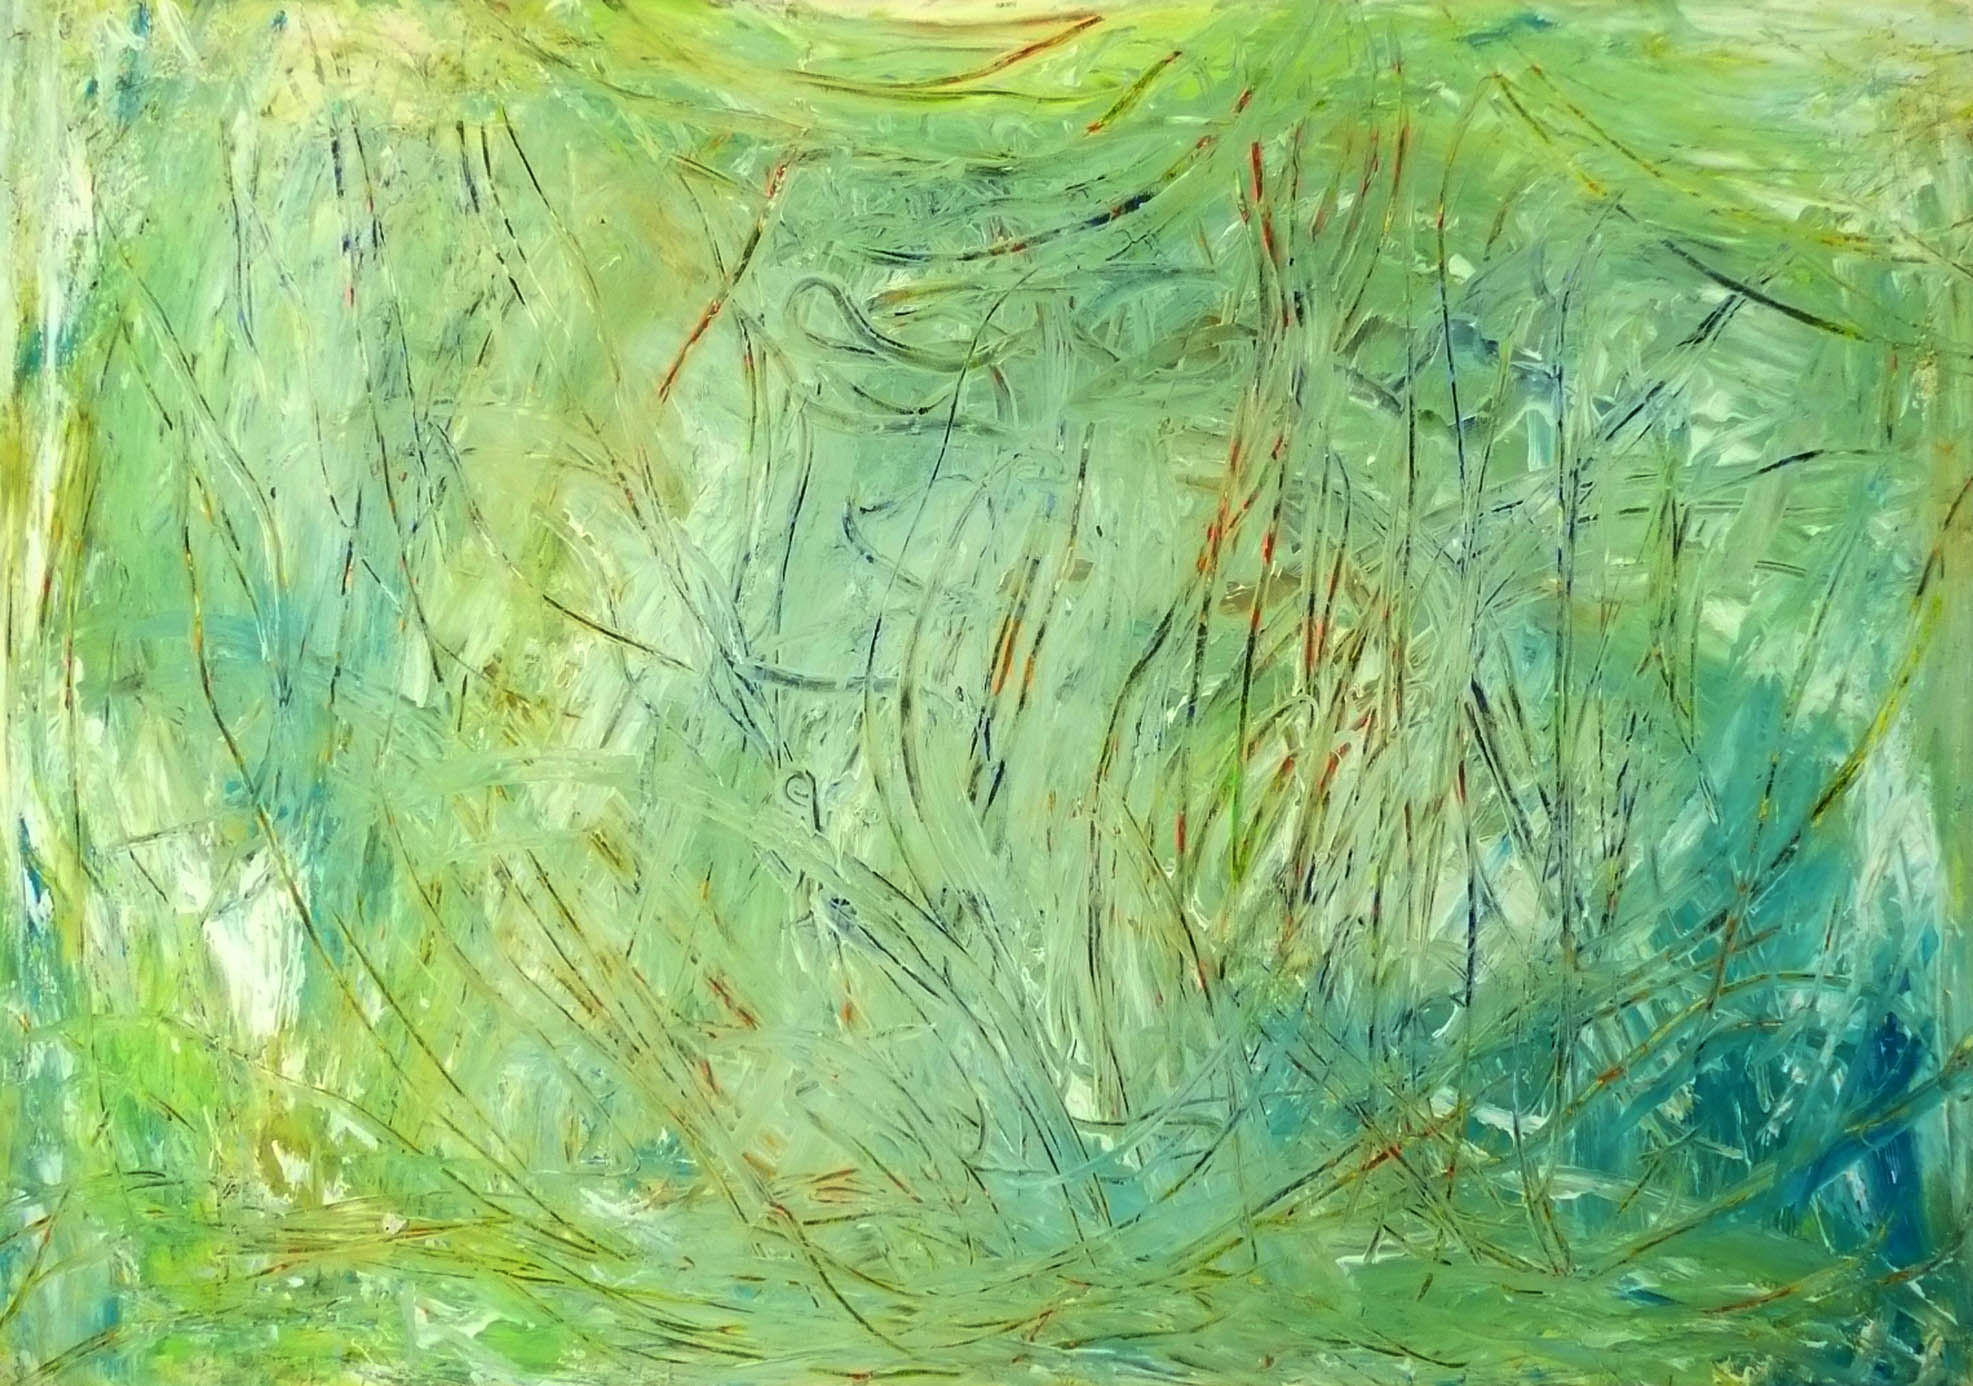 Peter Ballath, Mikado, 2012, Gouache auf Leinwand, 70 x 100 cm, (14)